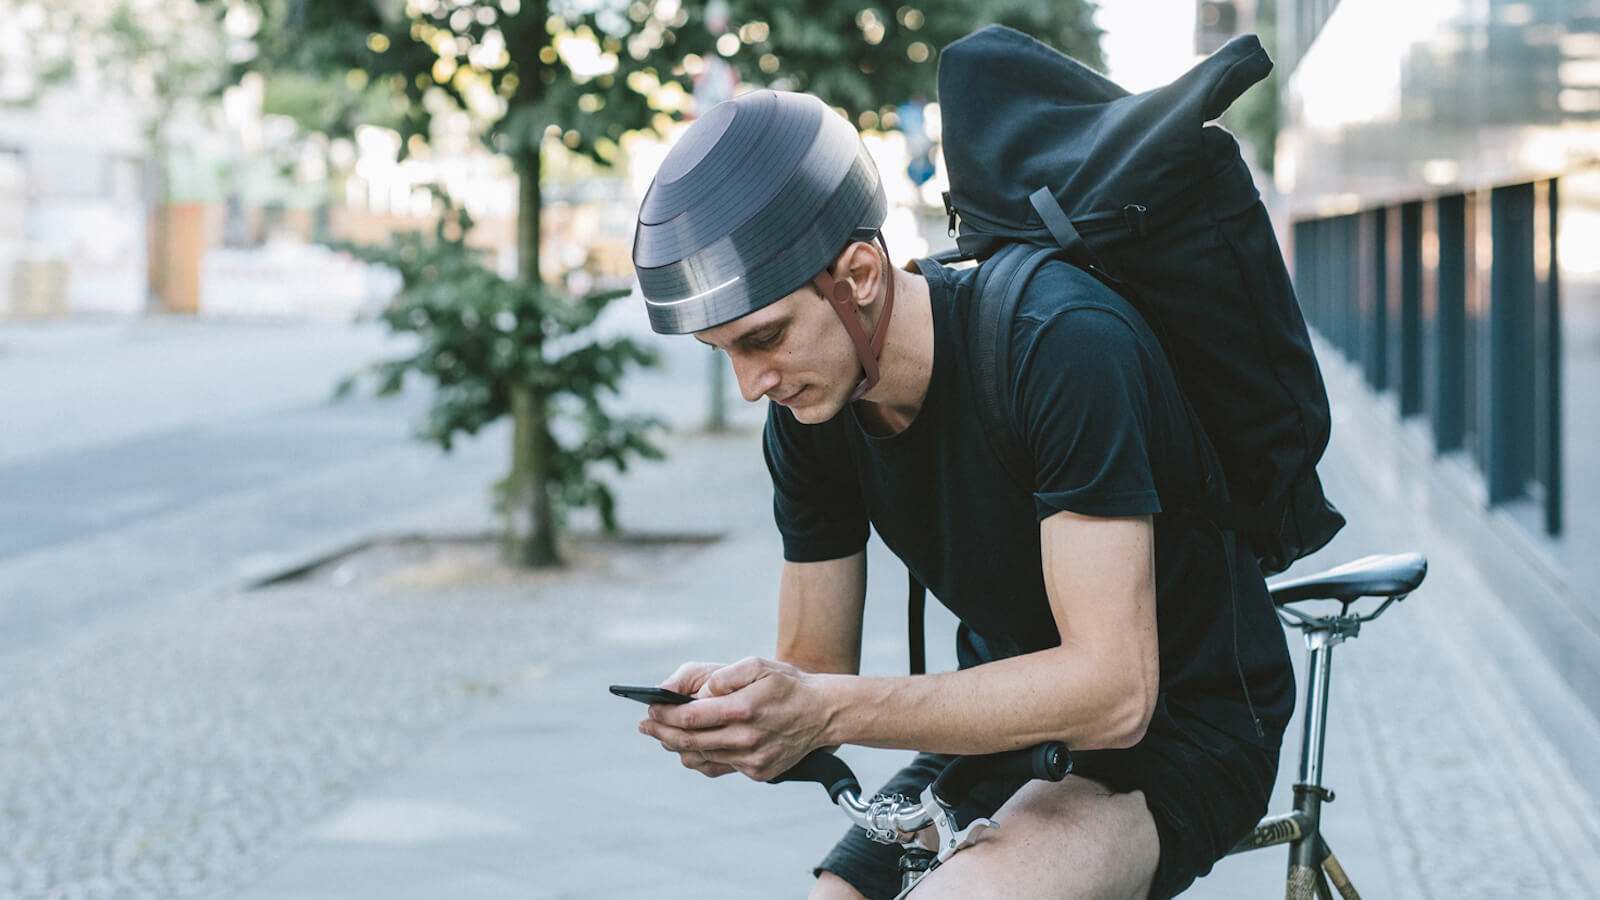 WertelOberfel ESUB Tracks Smart Helmet features a self-adjusting fitting system